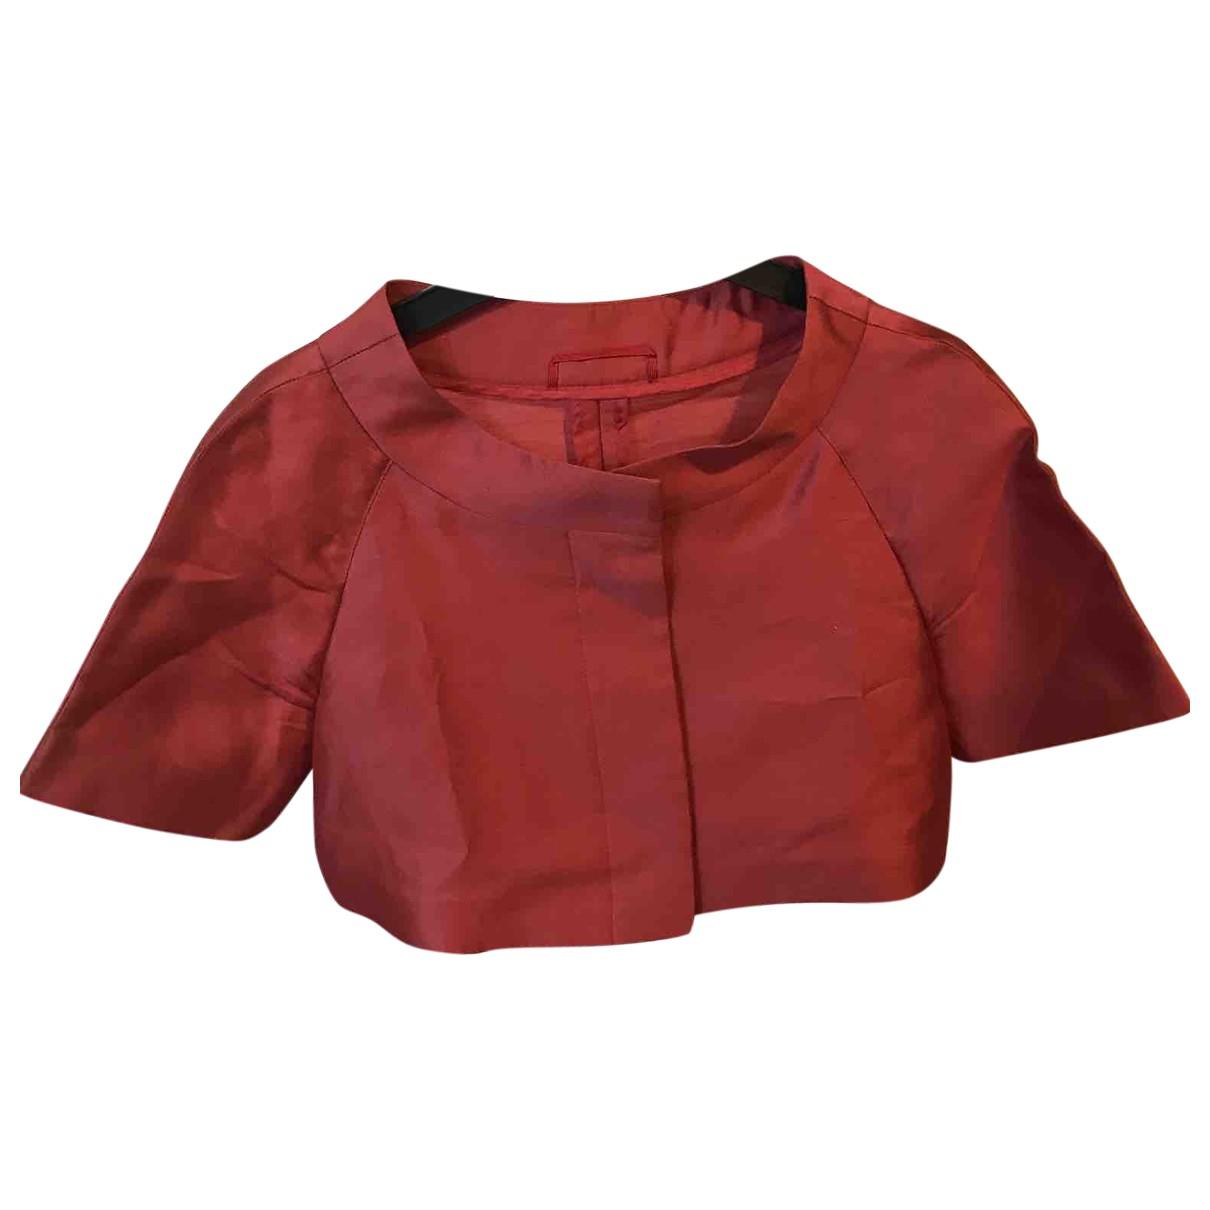 Max Mara Studio \N Pink jacket for Women 34 FR